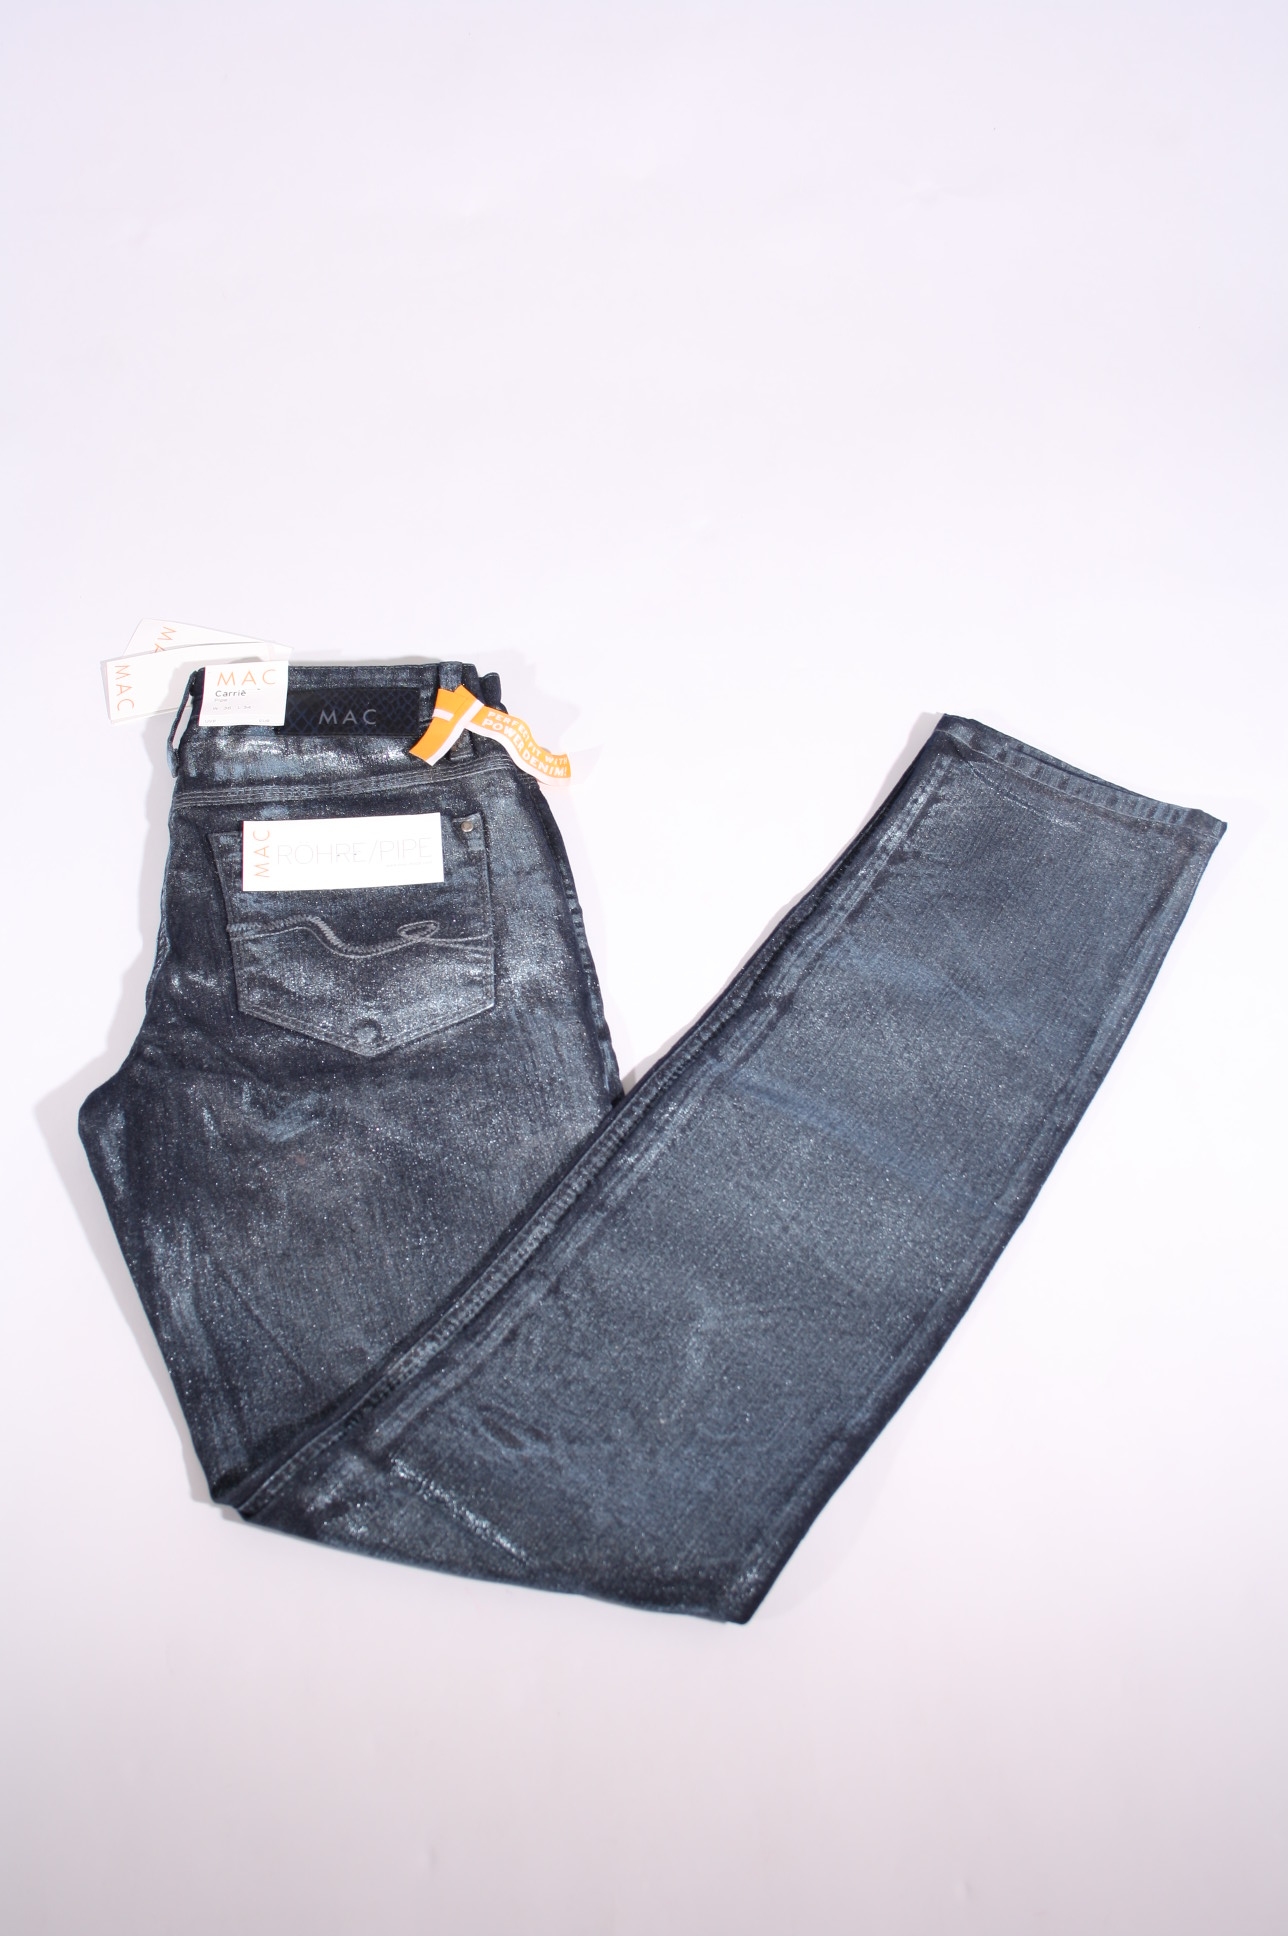 mac stretchhose jeans carrie pipe 0307 96 d060 dunkelblau. Black Bedroom Furniture Sets. Home Design Ideas